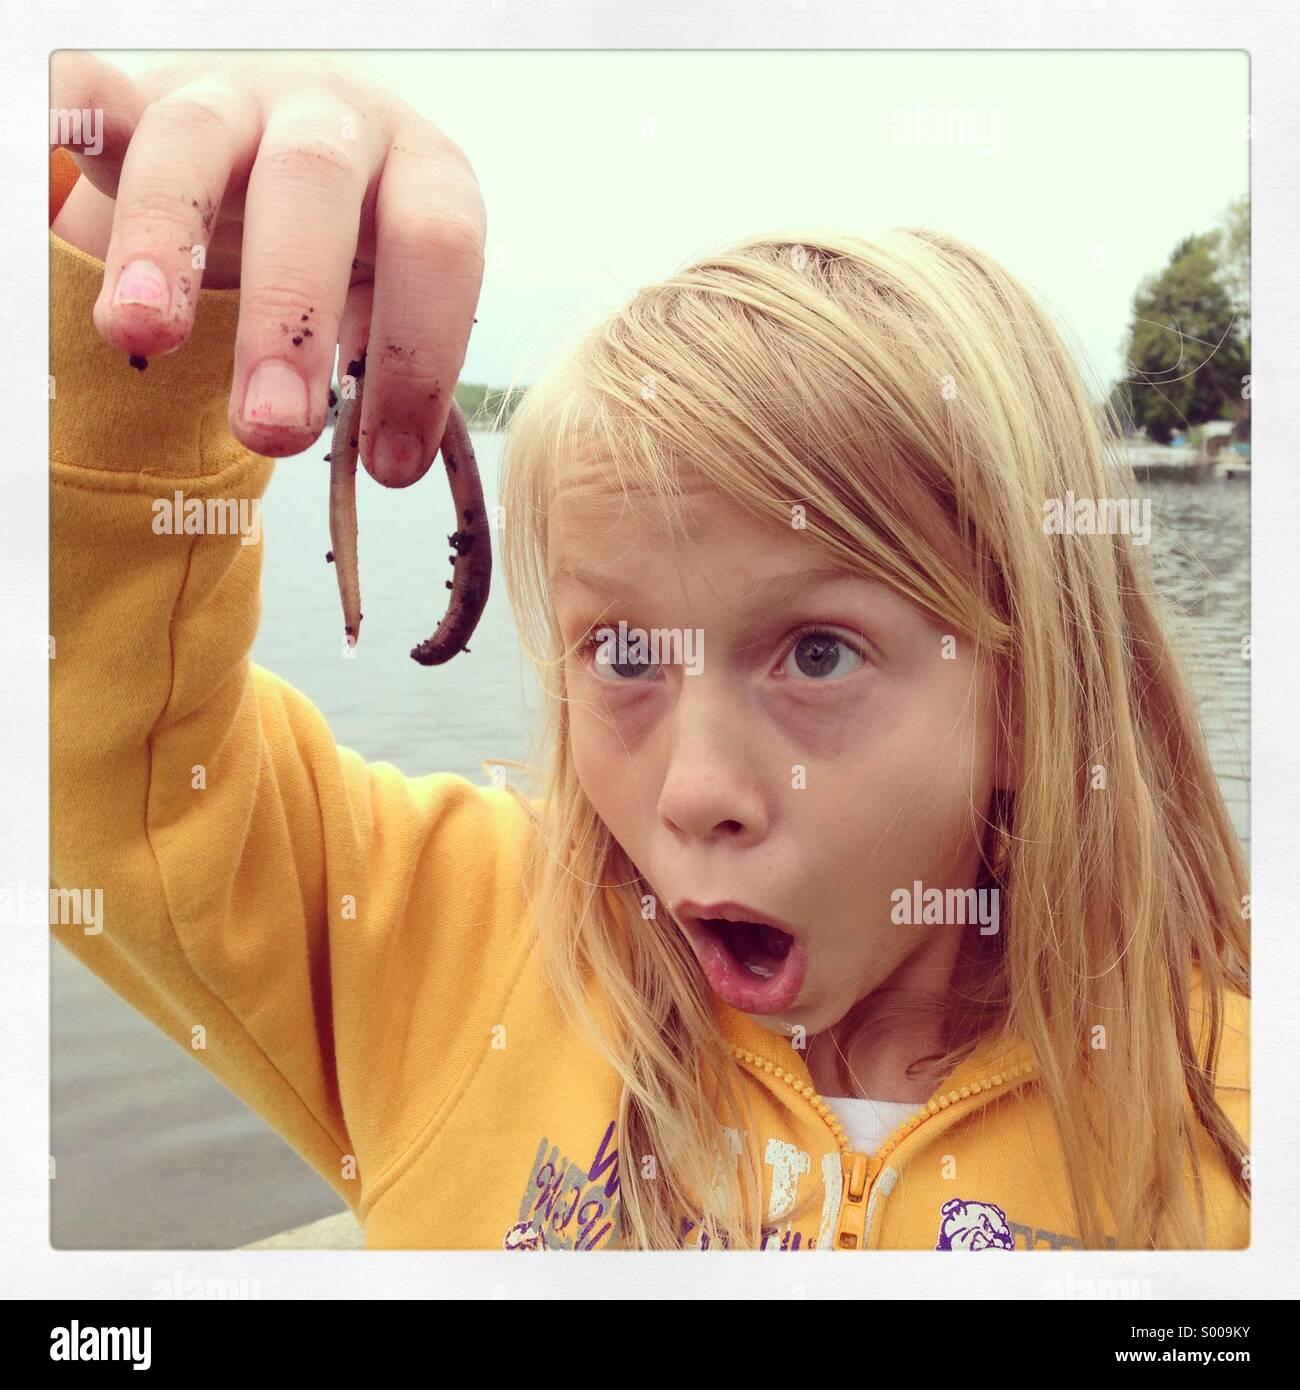 Une fille s'illuminera en regardant un crawly intimidées usés. Photo Stock